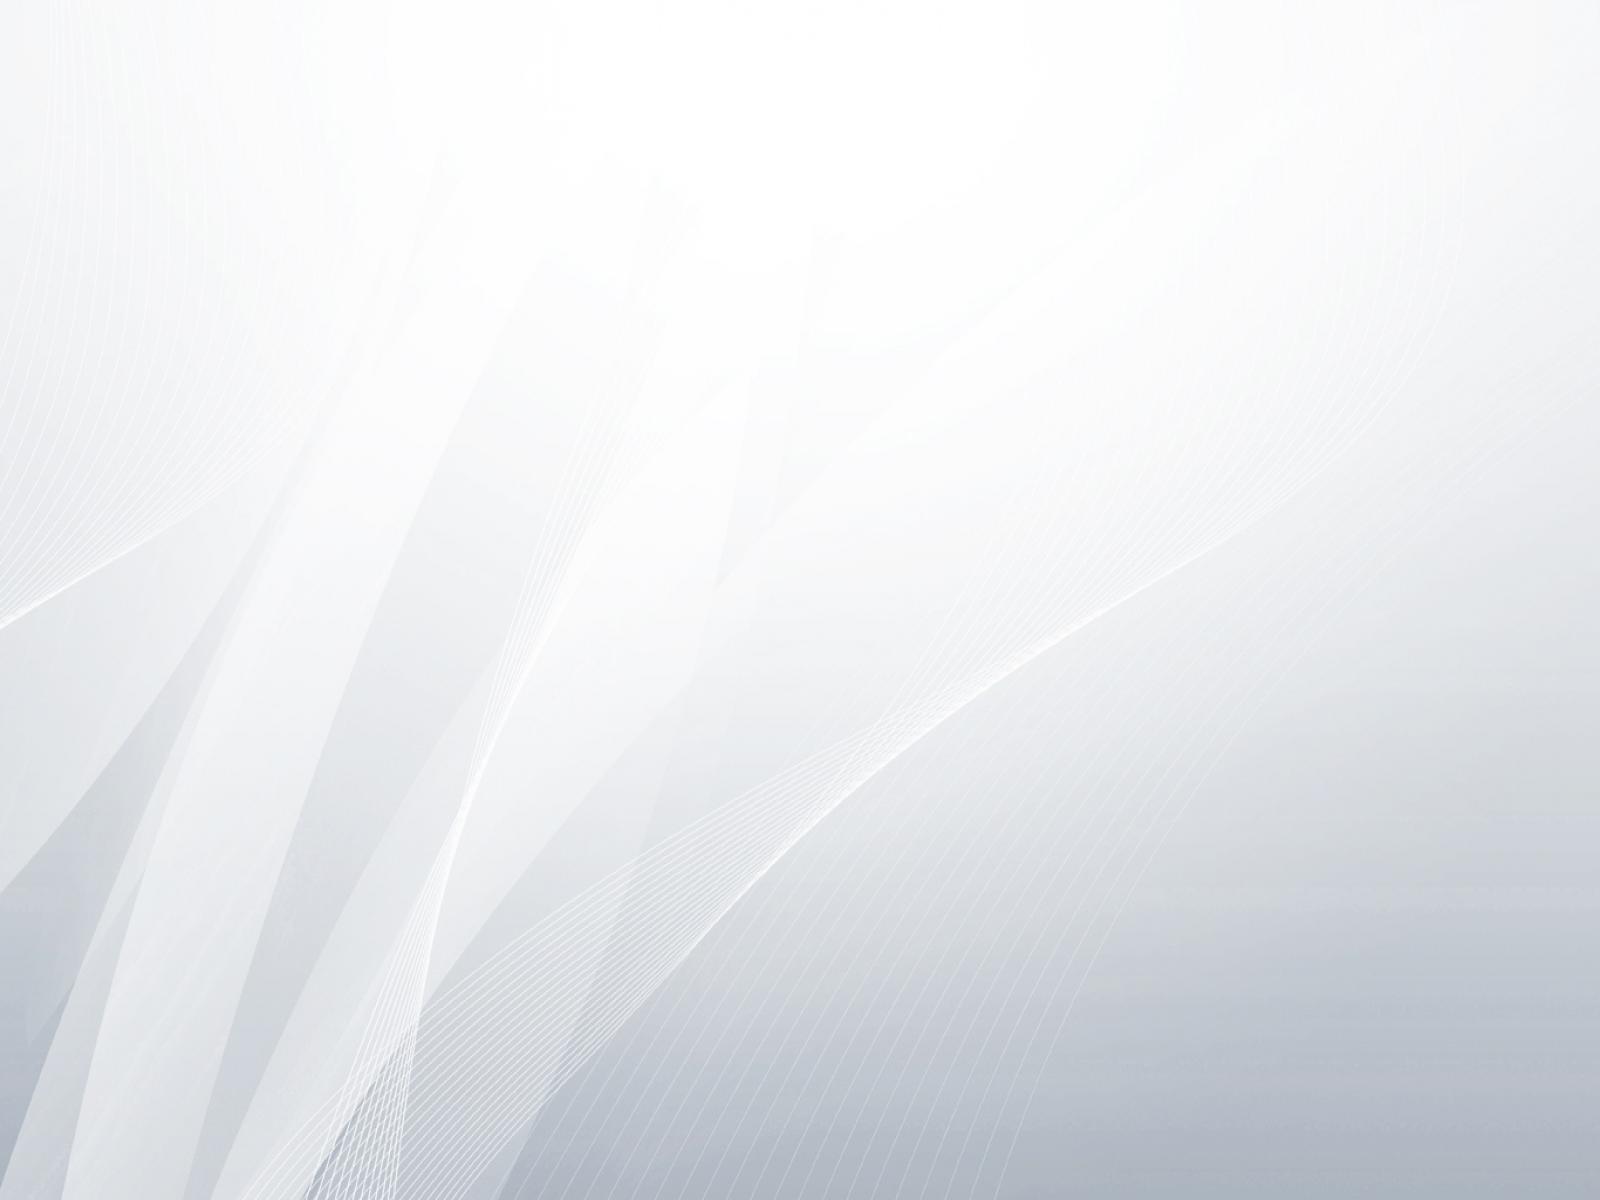 gray-bars-wallpapers